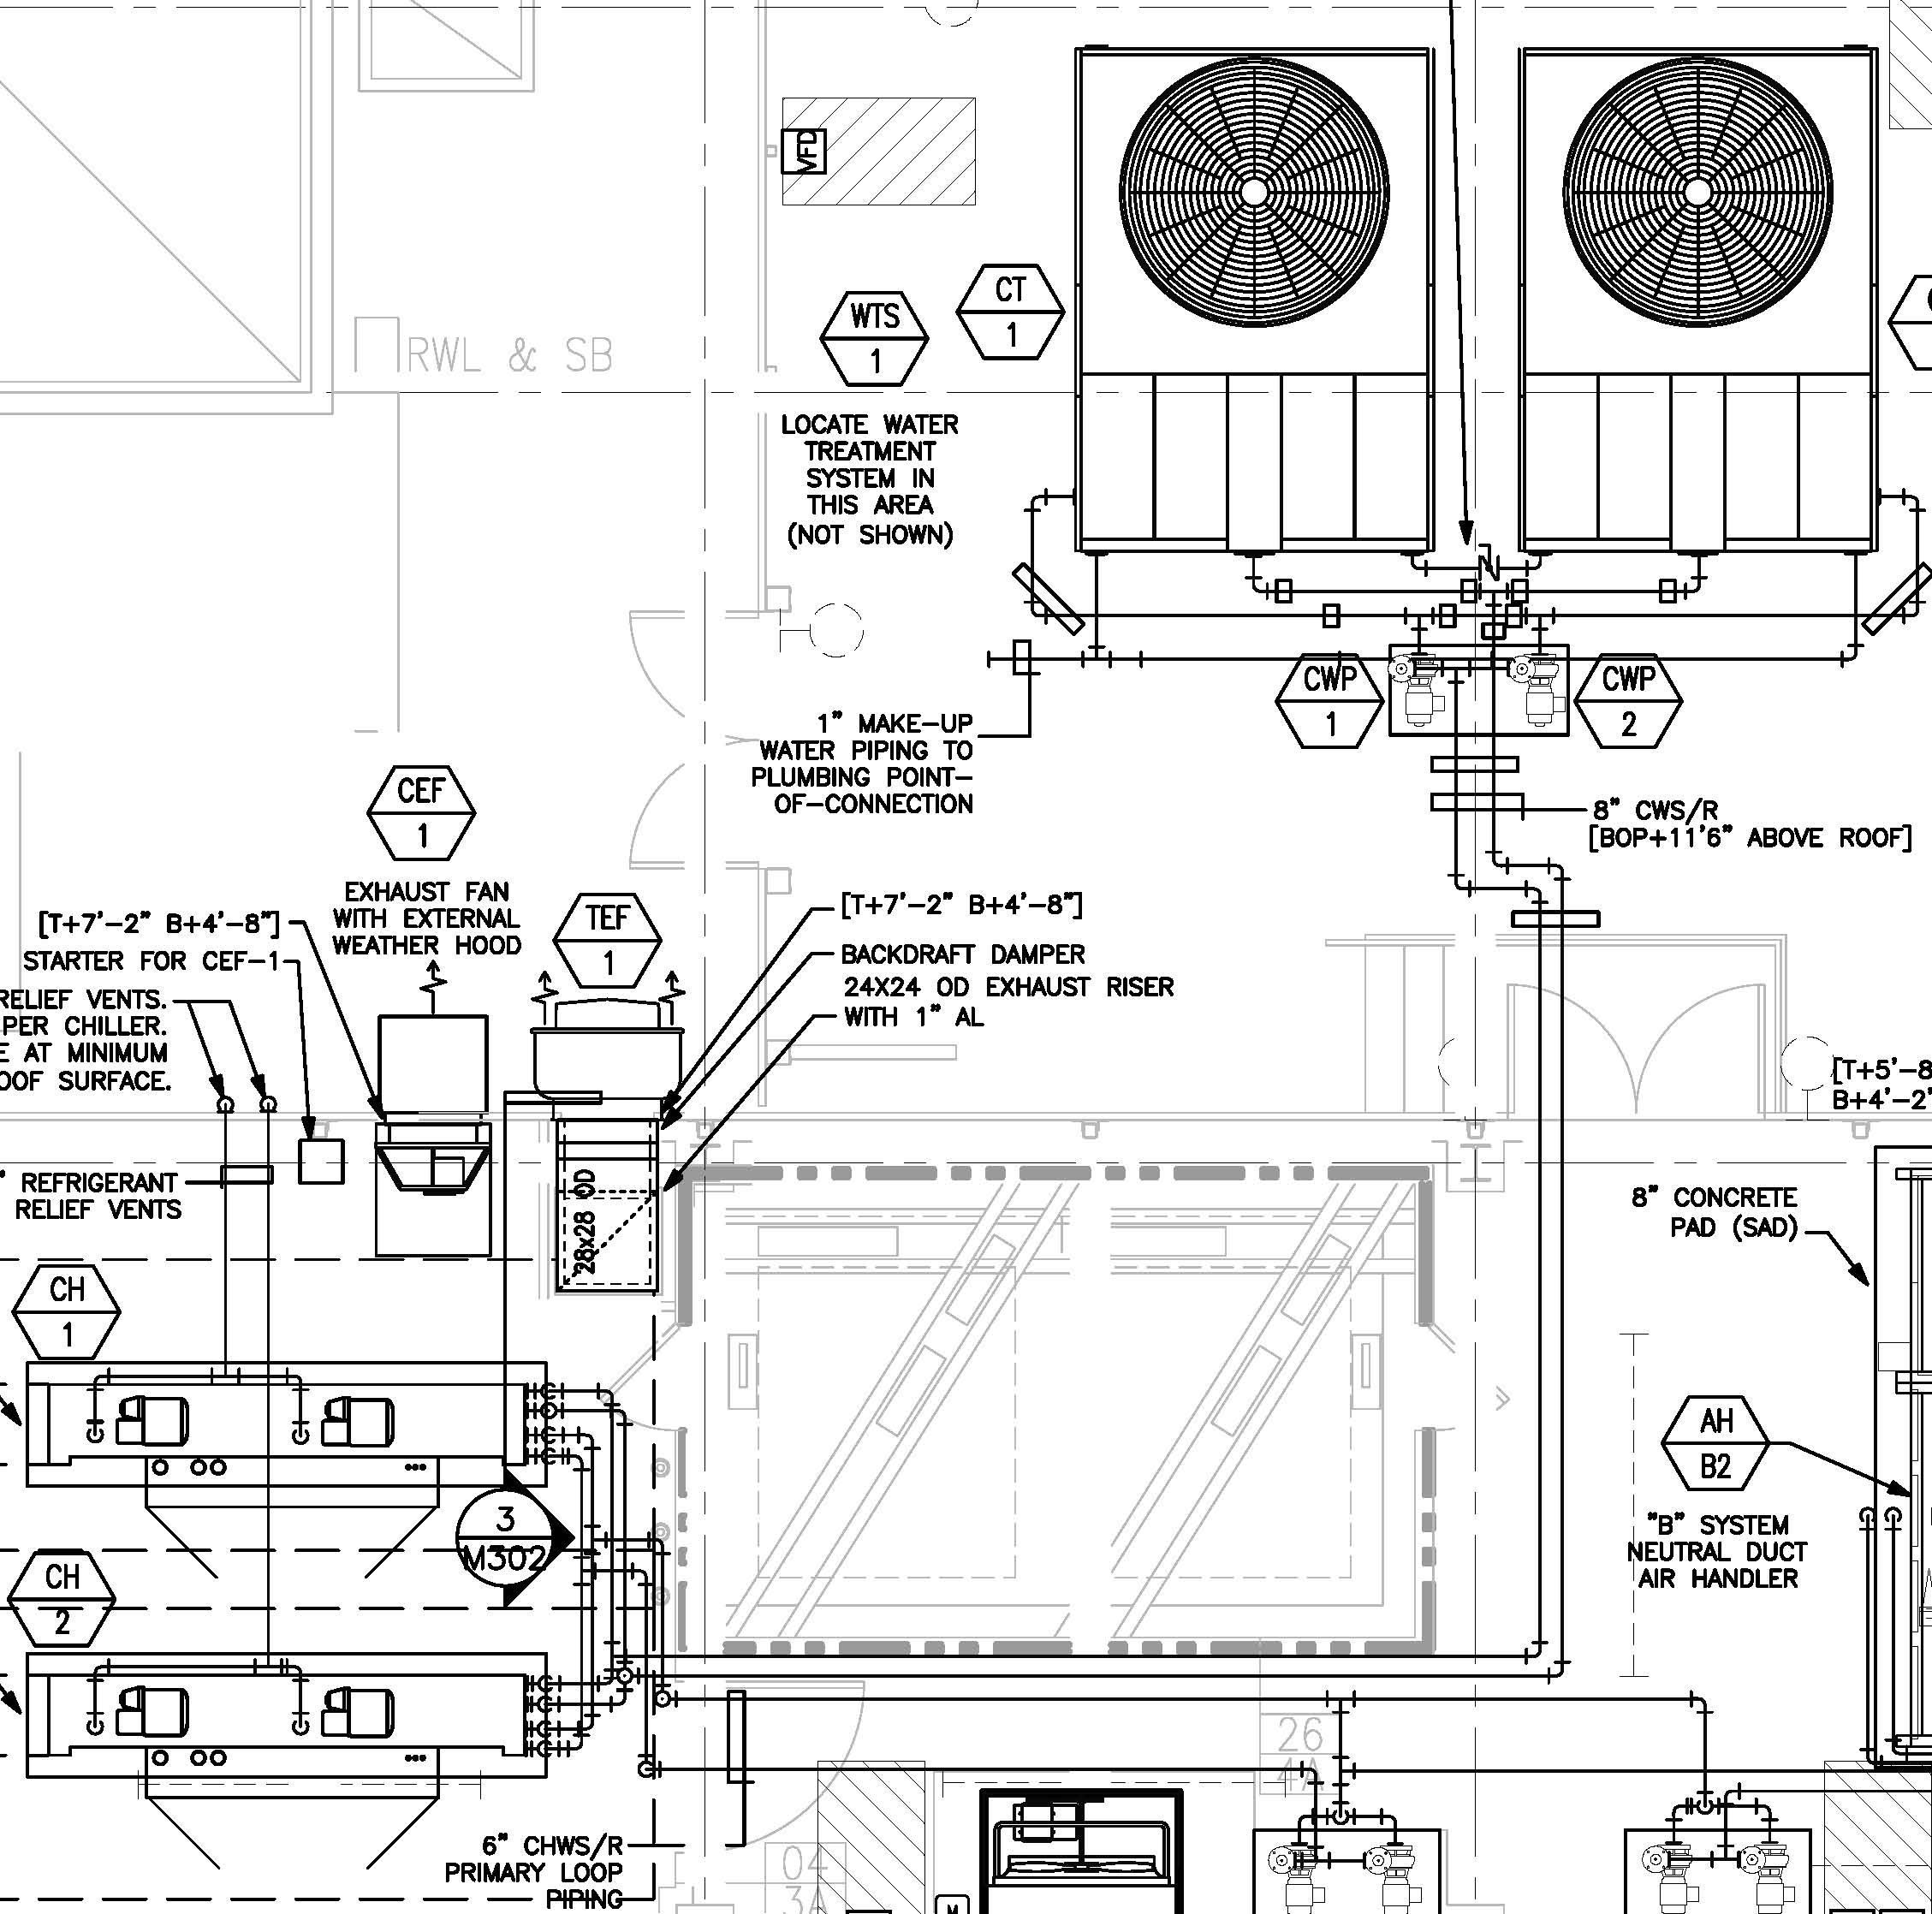 One Wire Alternator Diagram Ac Delco Wiring Diagram Best ... Ac Delco Wiring Diagram on